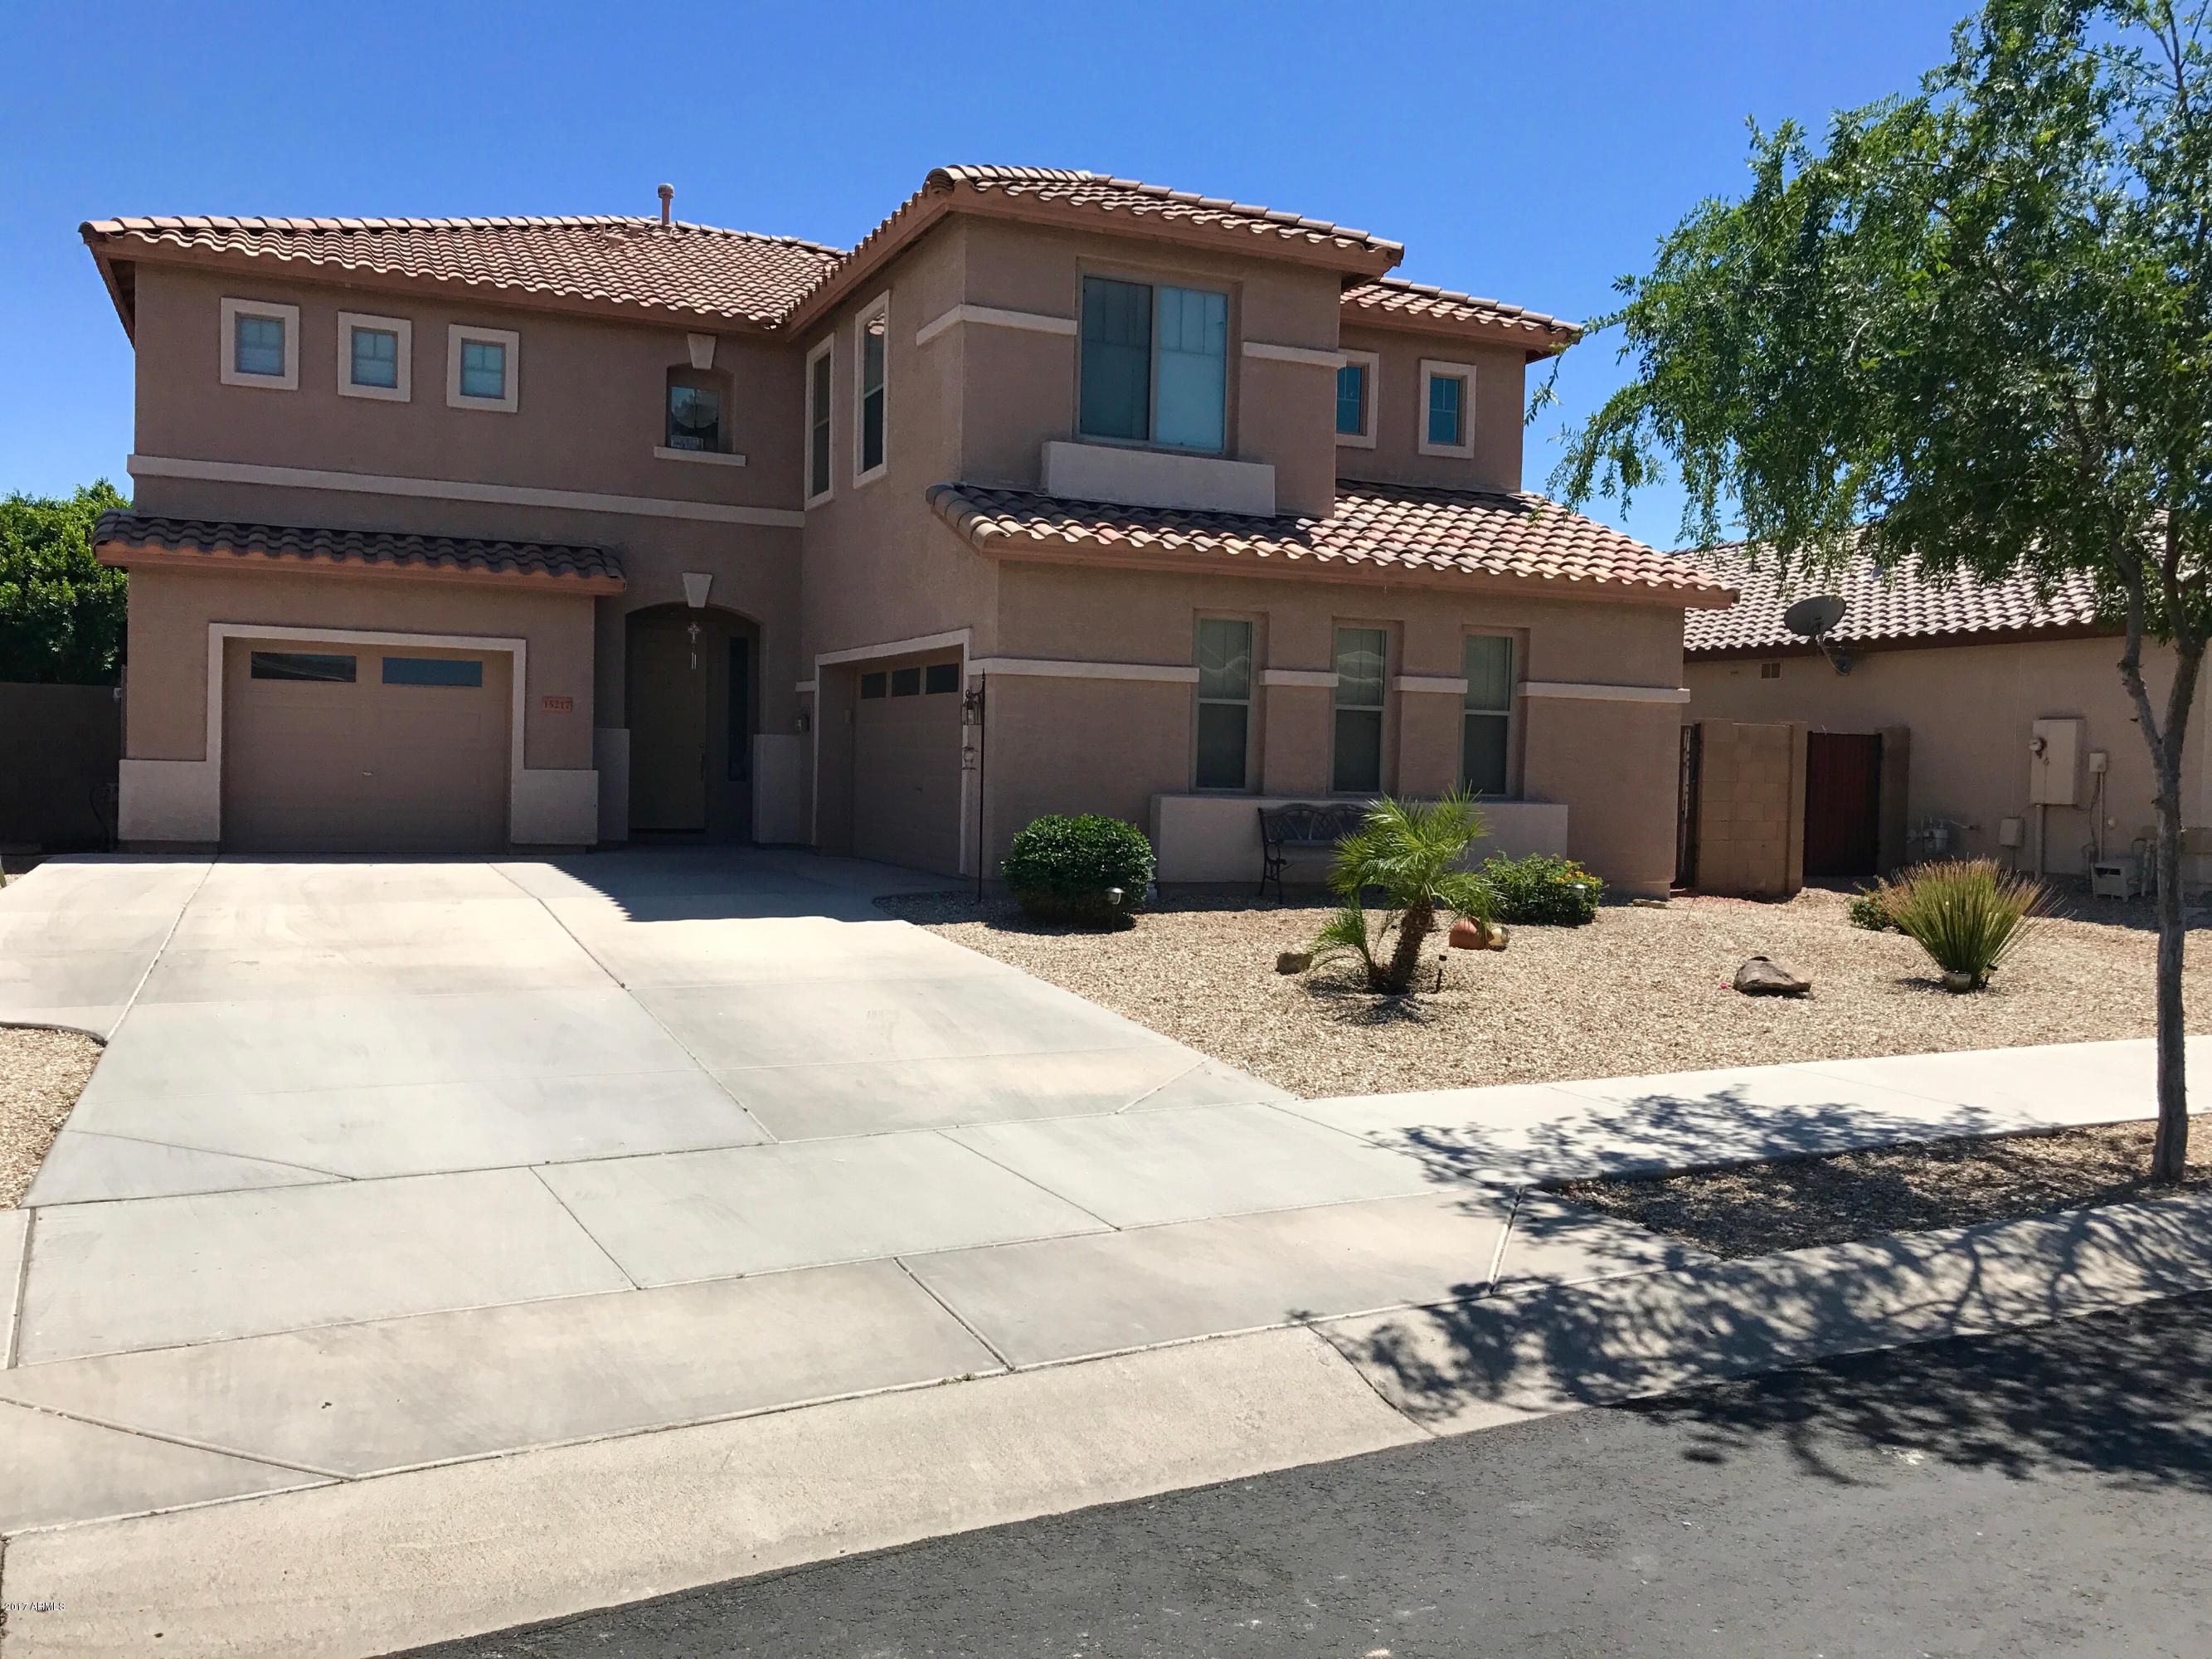 15217 W Morning Glory Street, Goodyear, AZ 85338